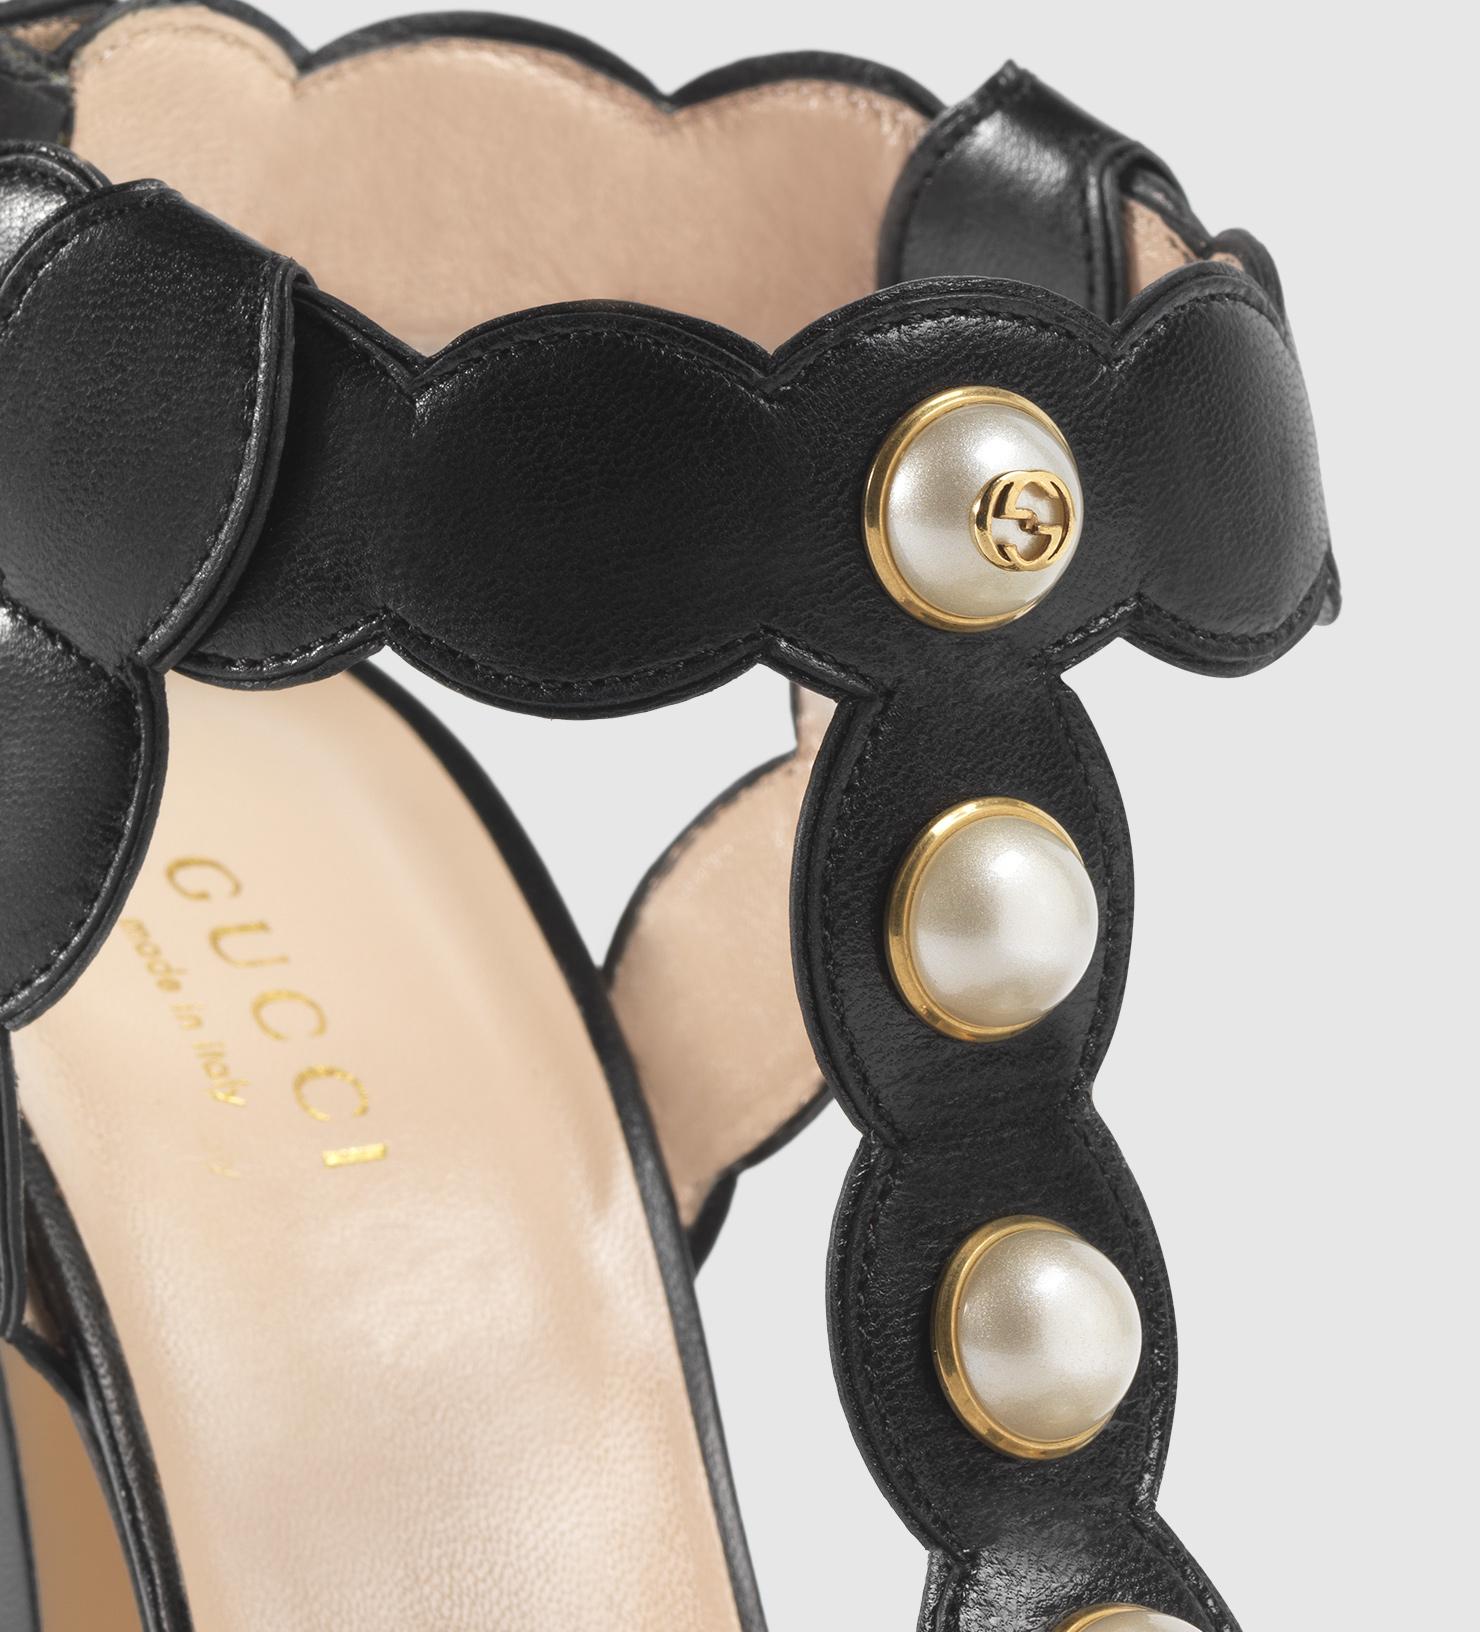 8b4db054da8cab Gucci Willow Leather T-strap Sandal in Black - Lyst